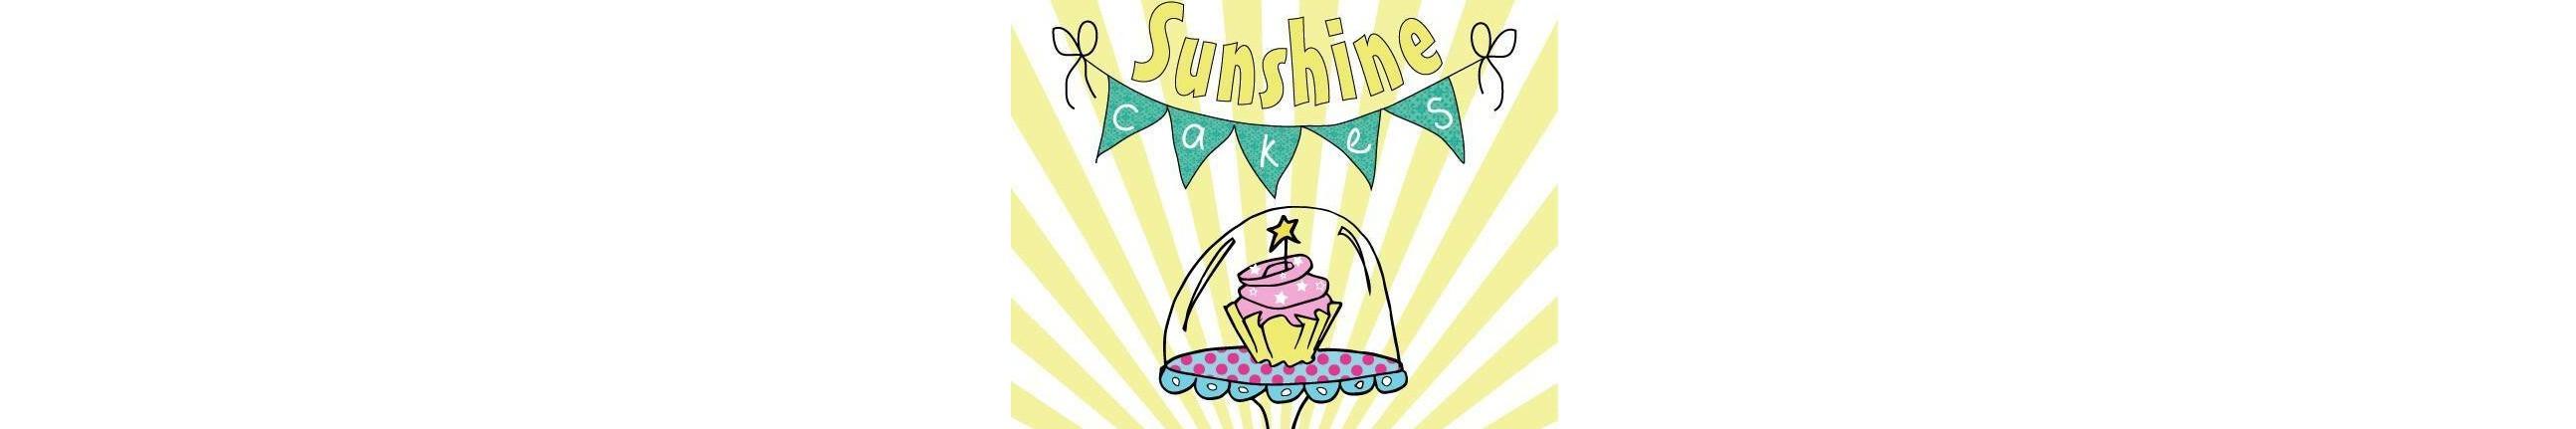 Sunshine Cakes Estepona